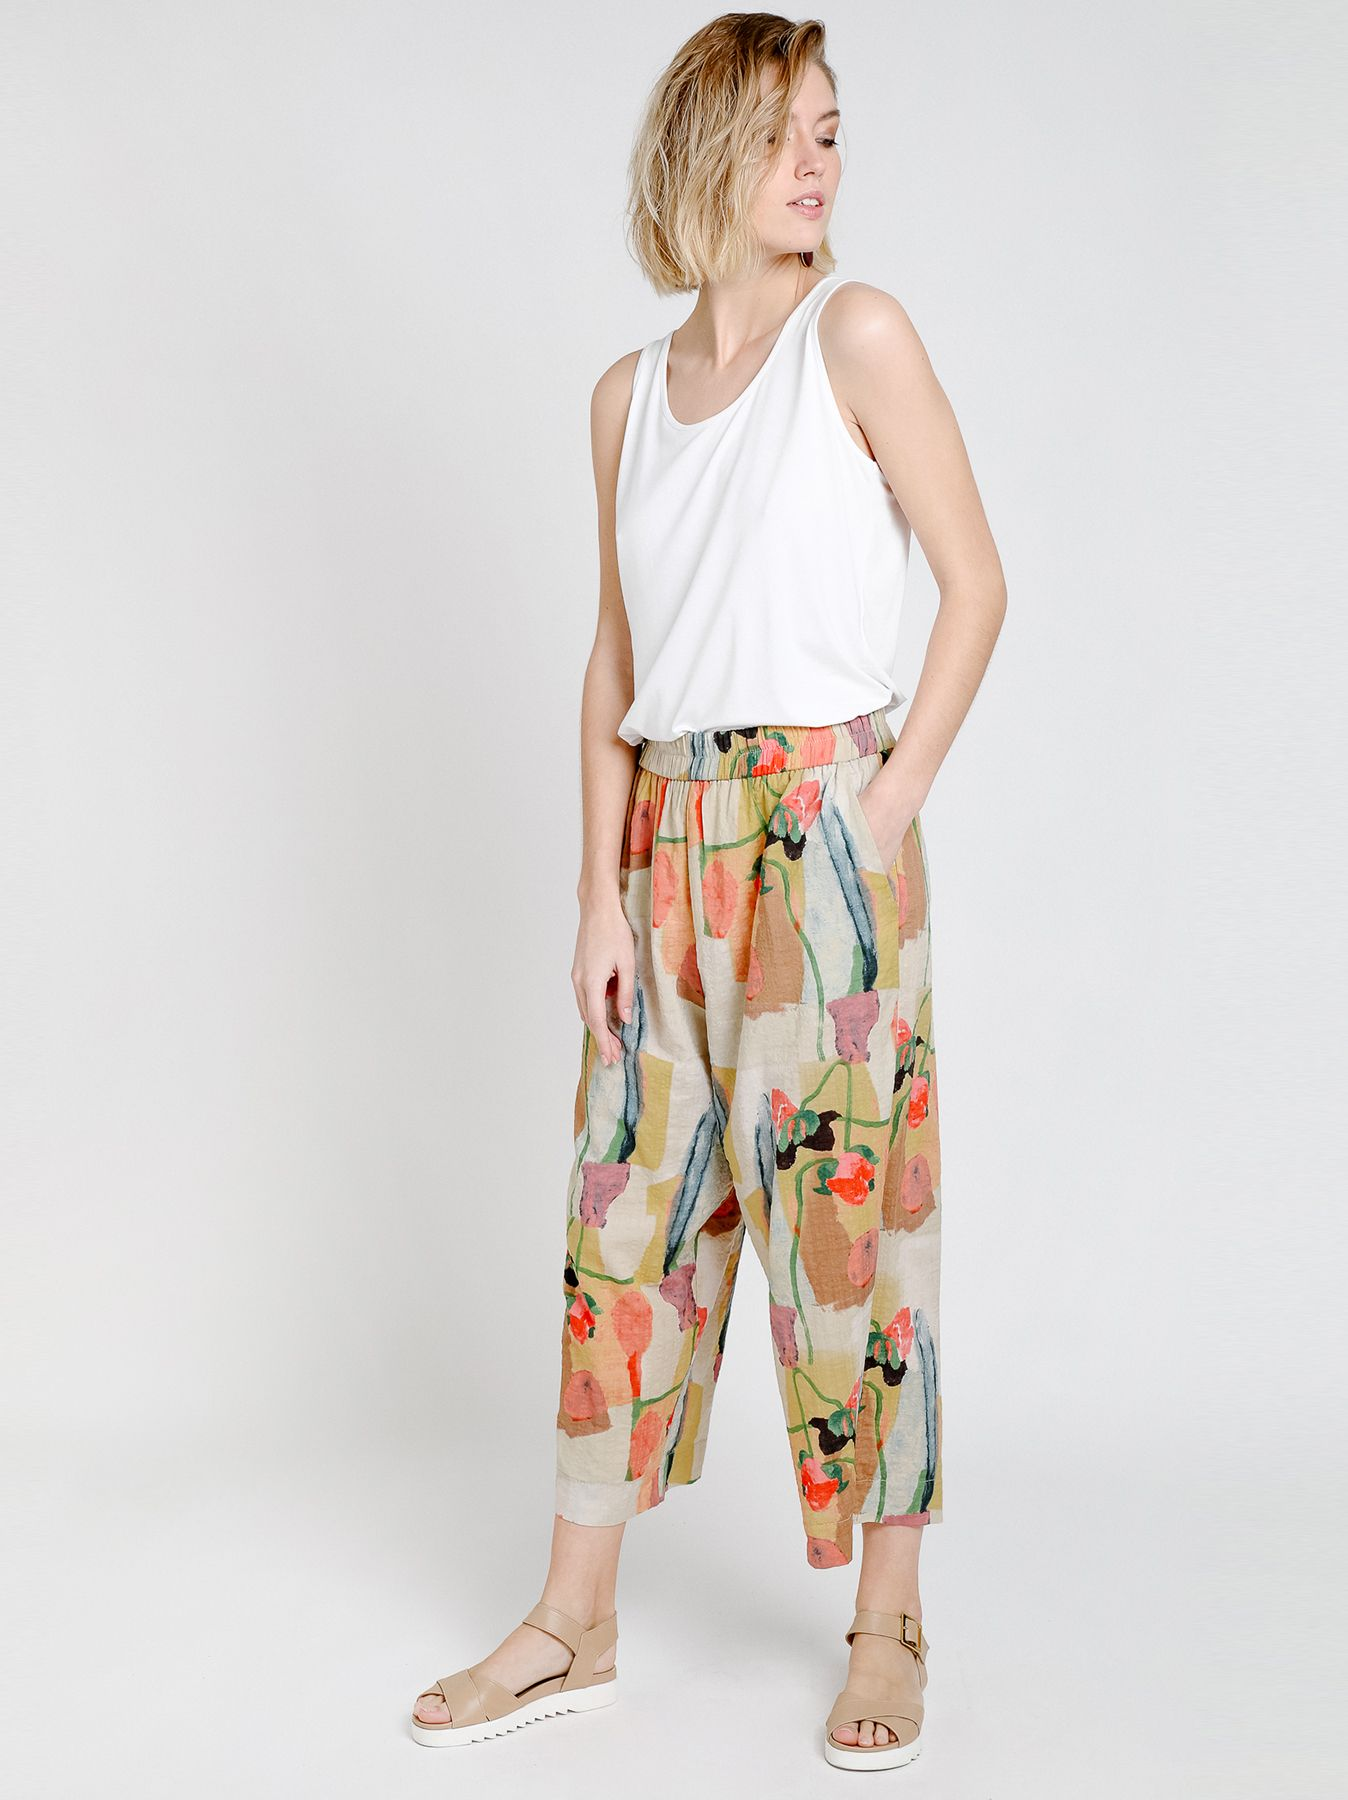 Printed cotton gaucho pants